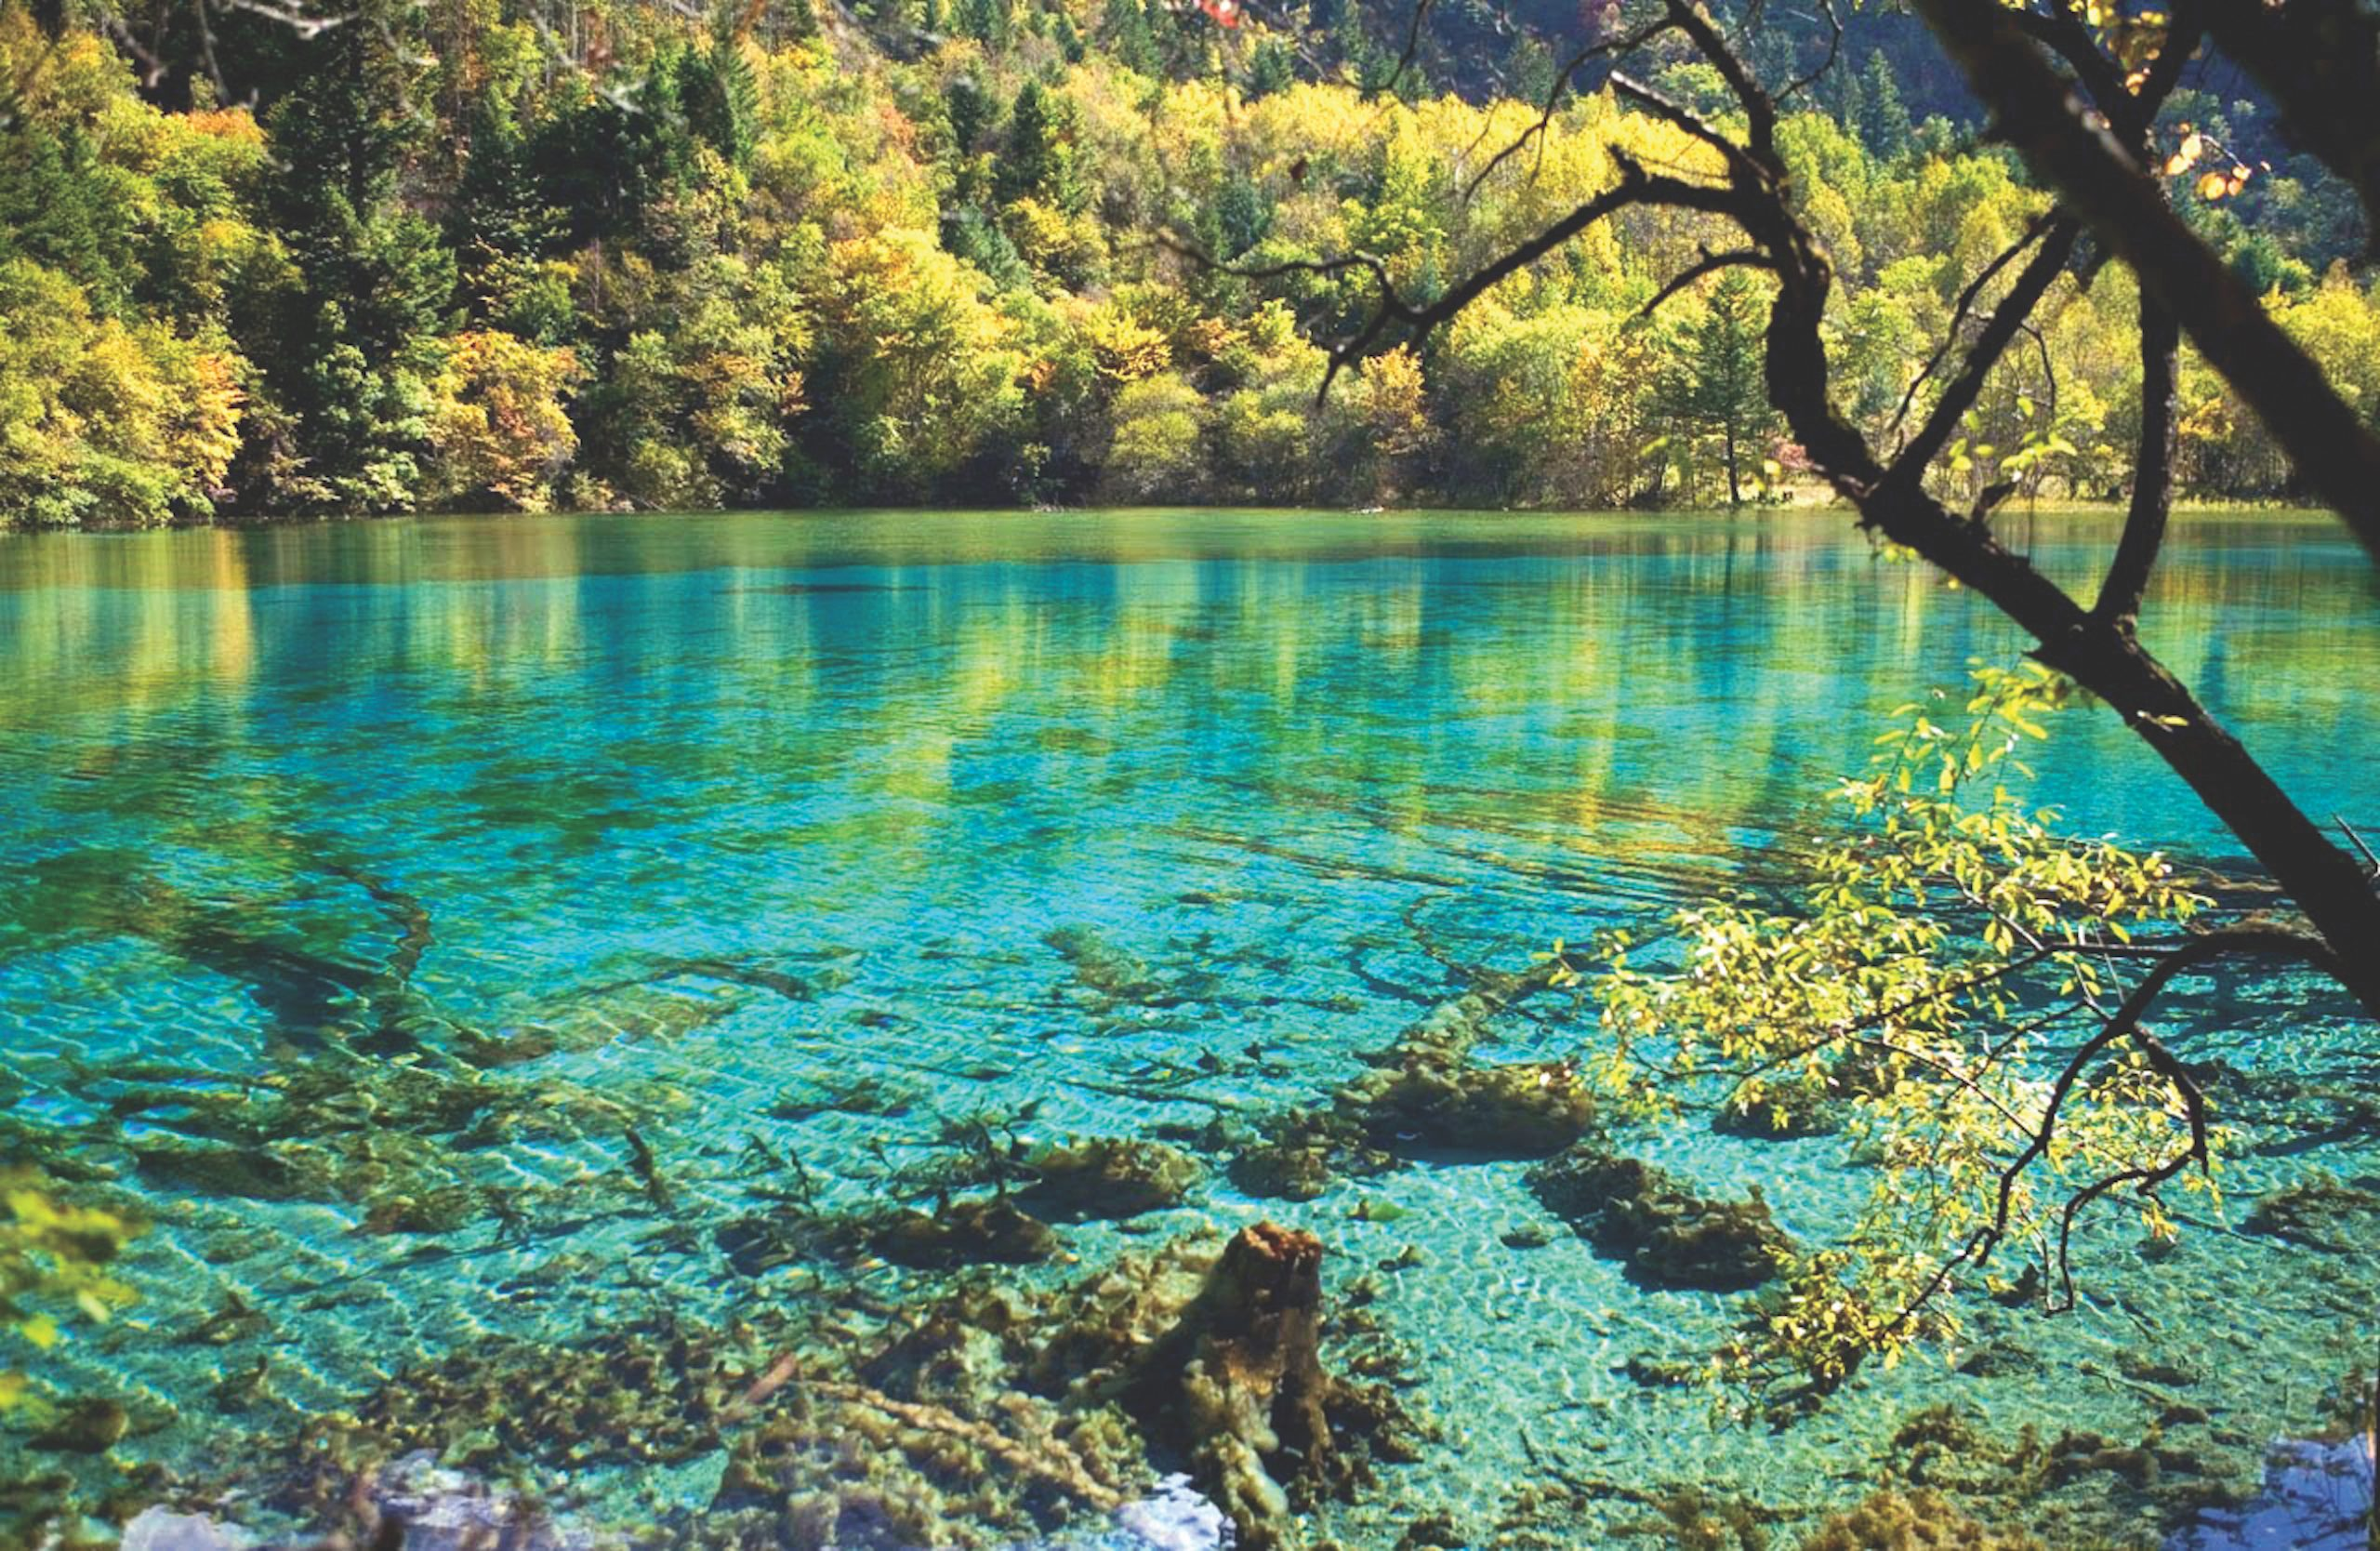 8 danau unik di Indonesia akibat fenomena alam.